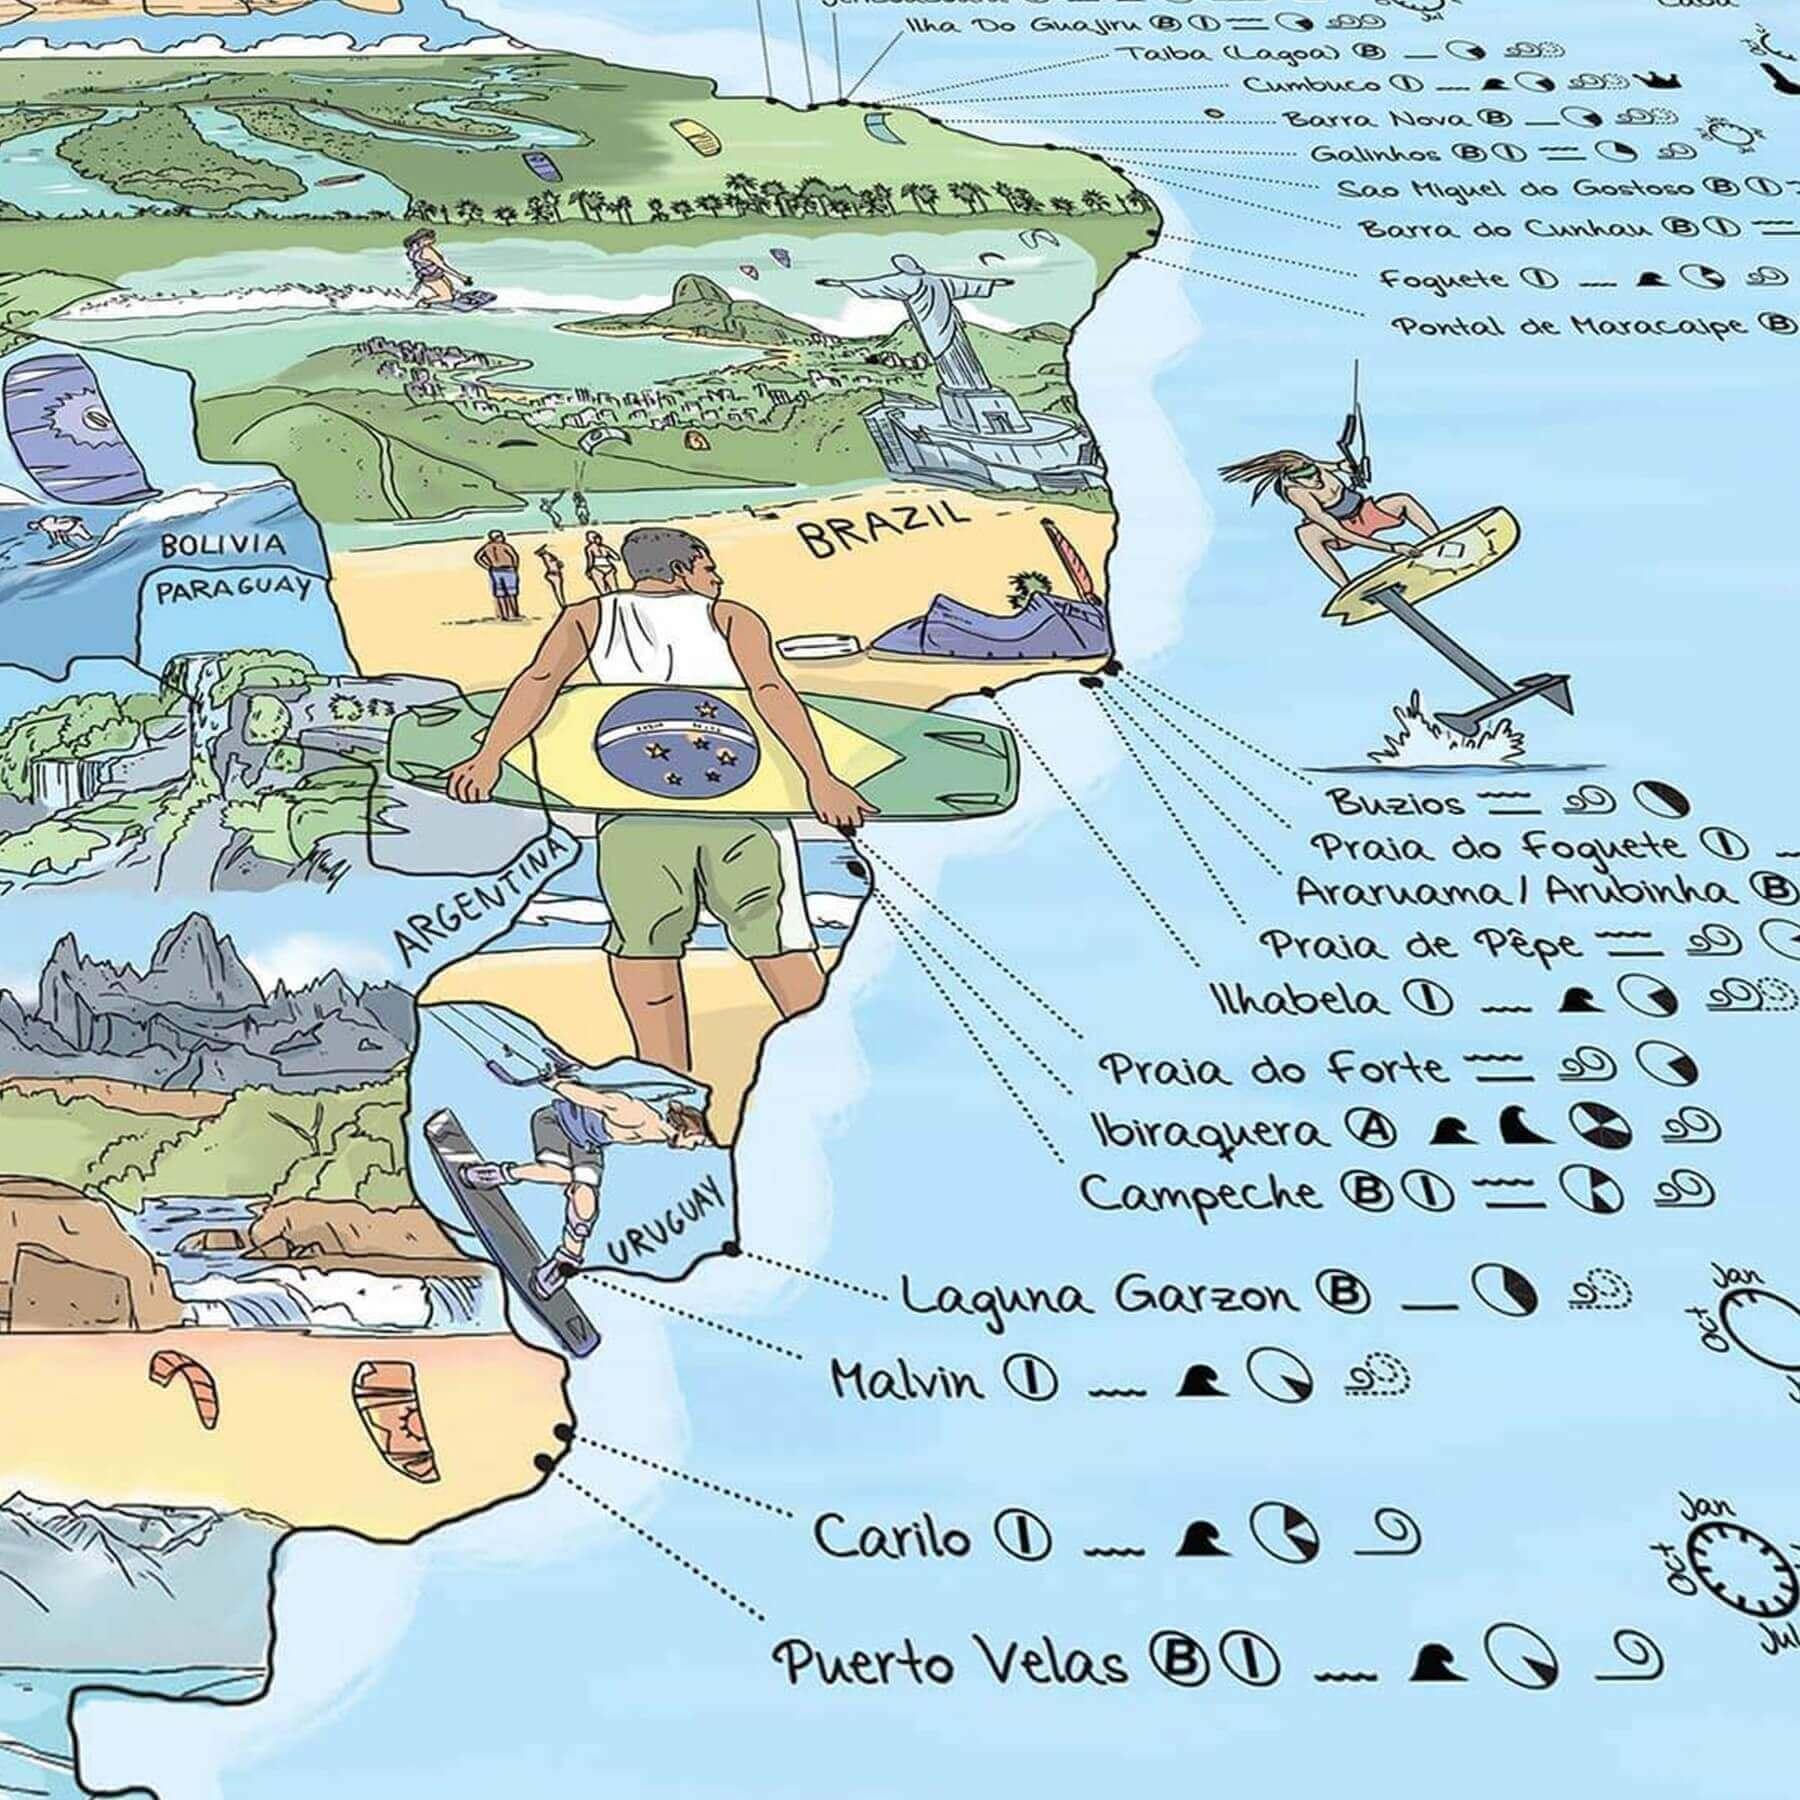 Carte Du Monde Kitesurf.Carte Du Monde Des Spots De Kitesurf